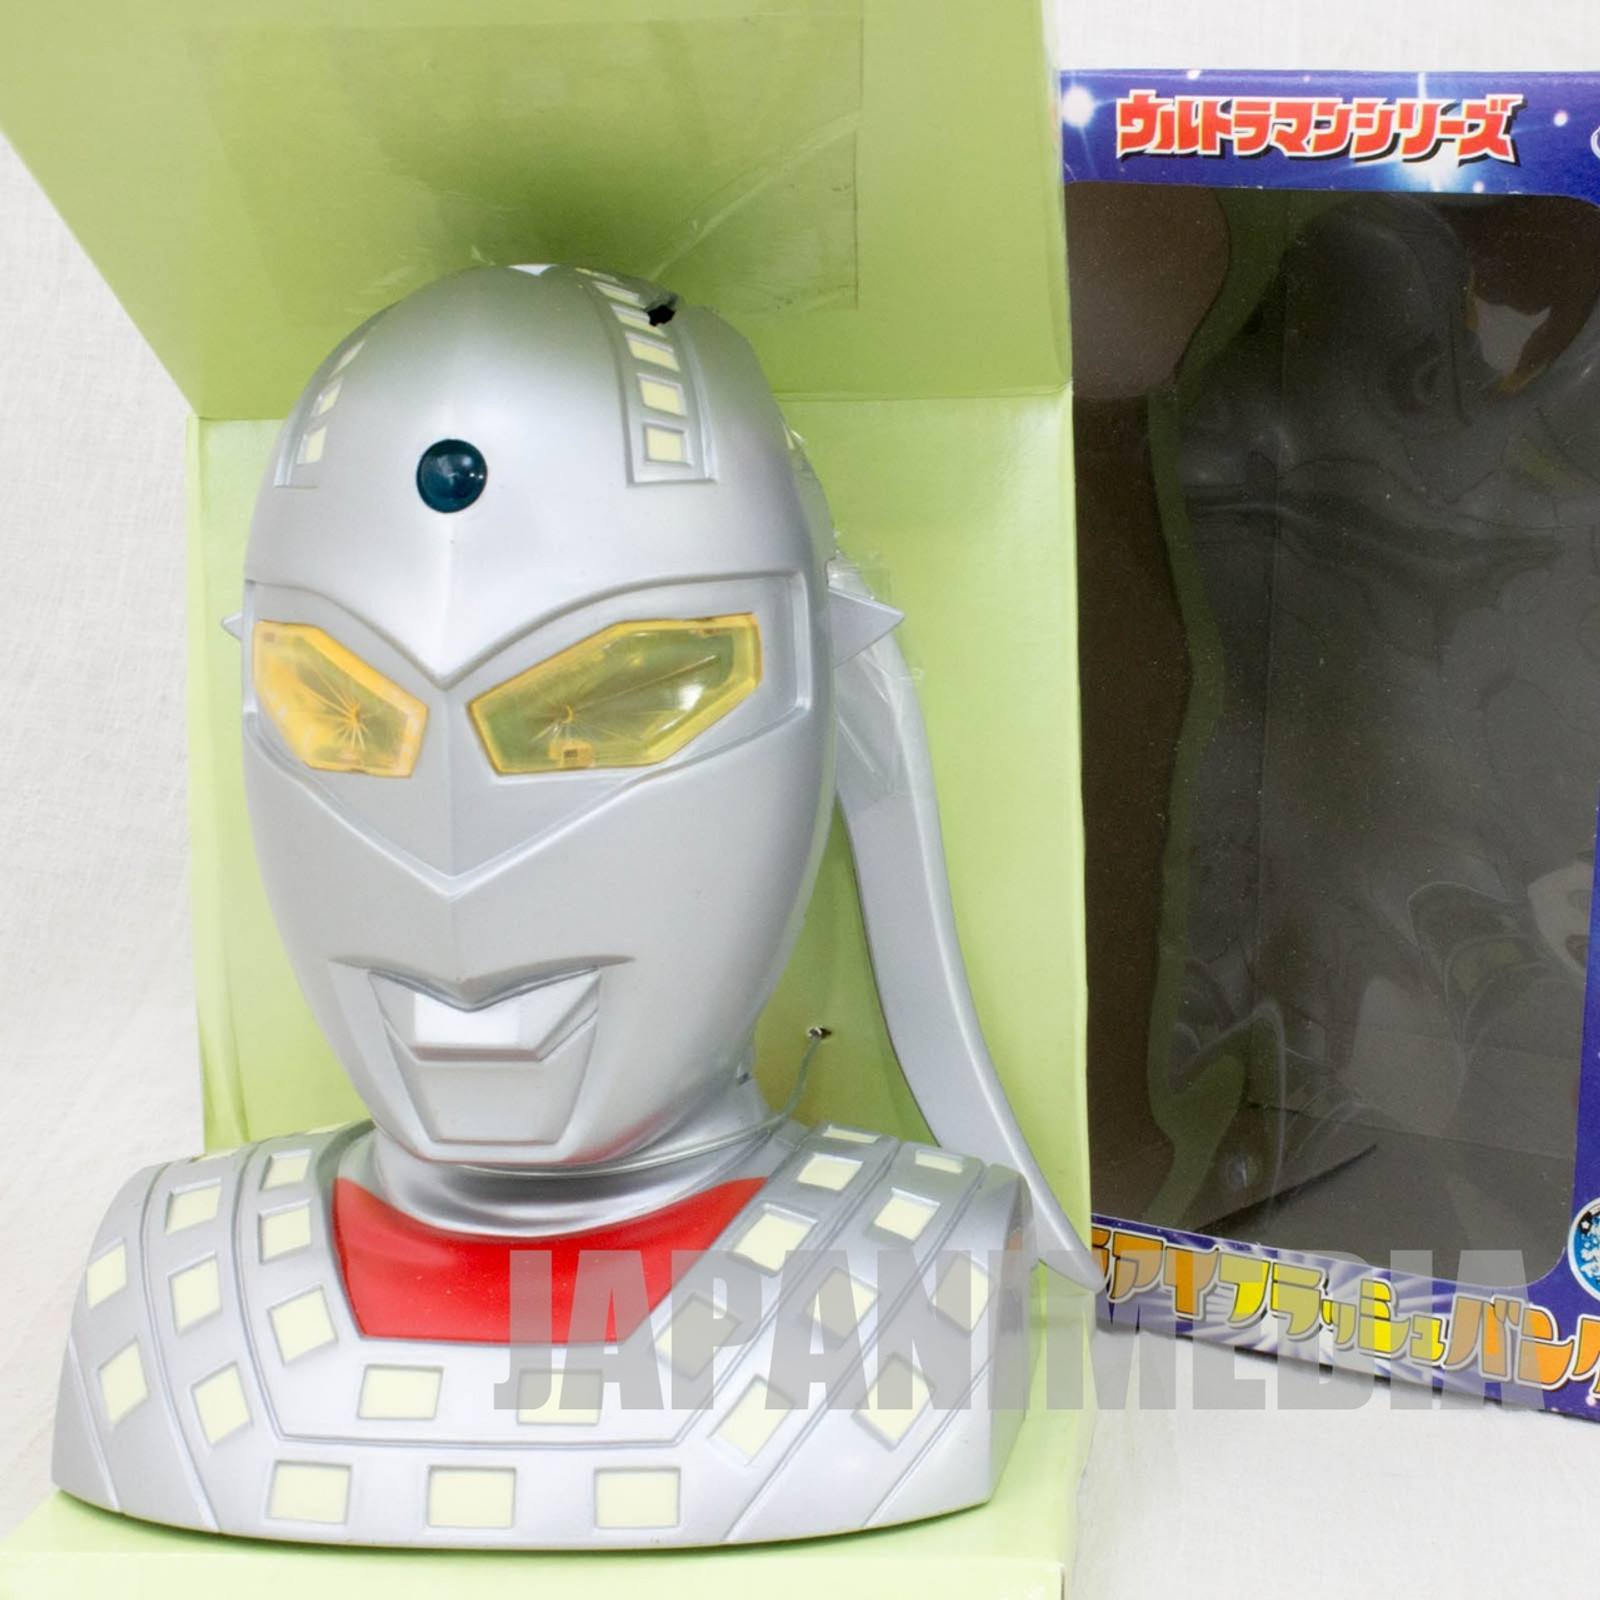 Ultraman Seven Ultra Eye Flash Bank Figure Banpresto JAPAN ANIME TOKUSATSU